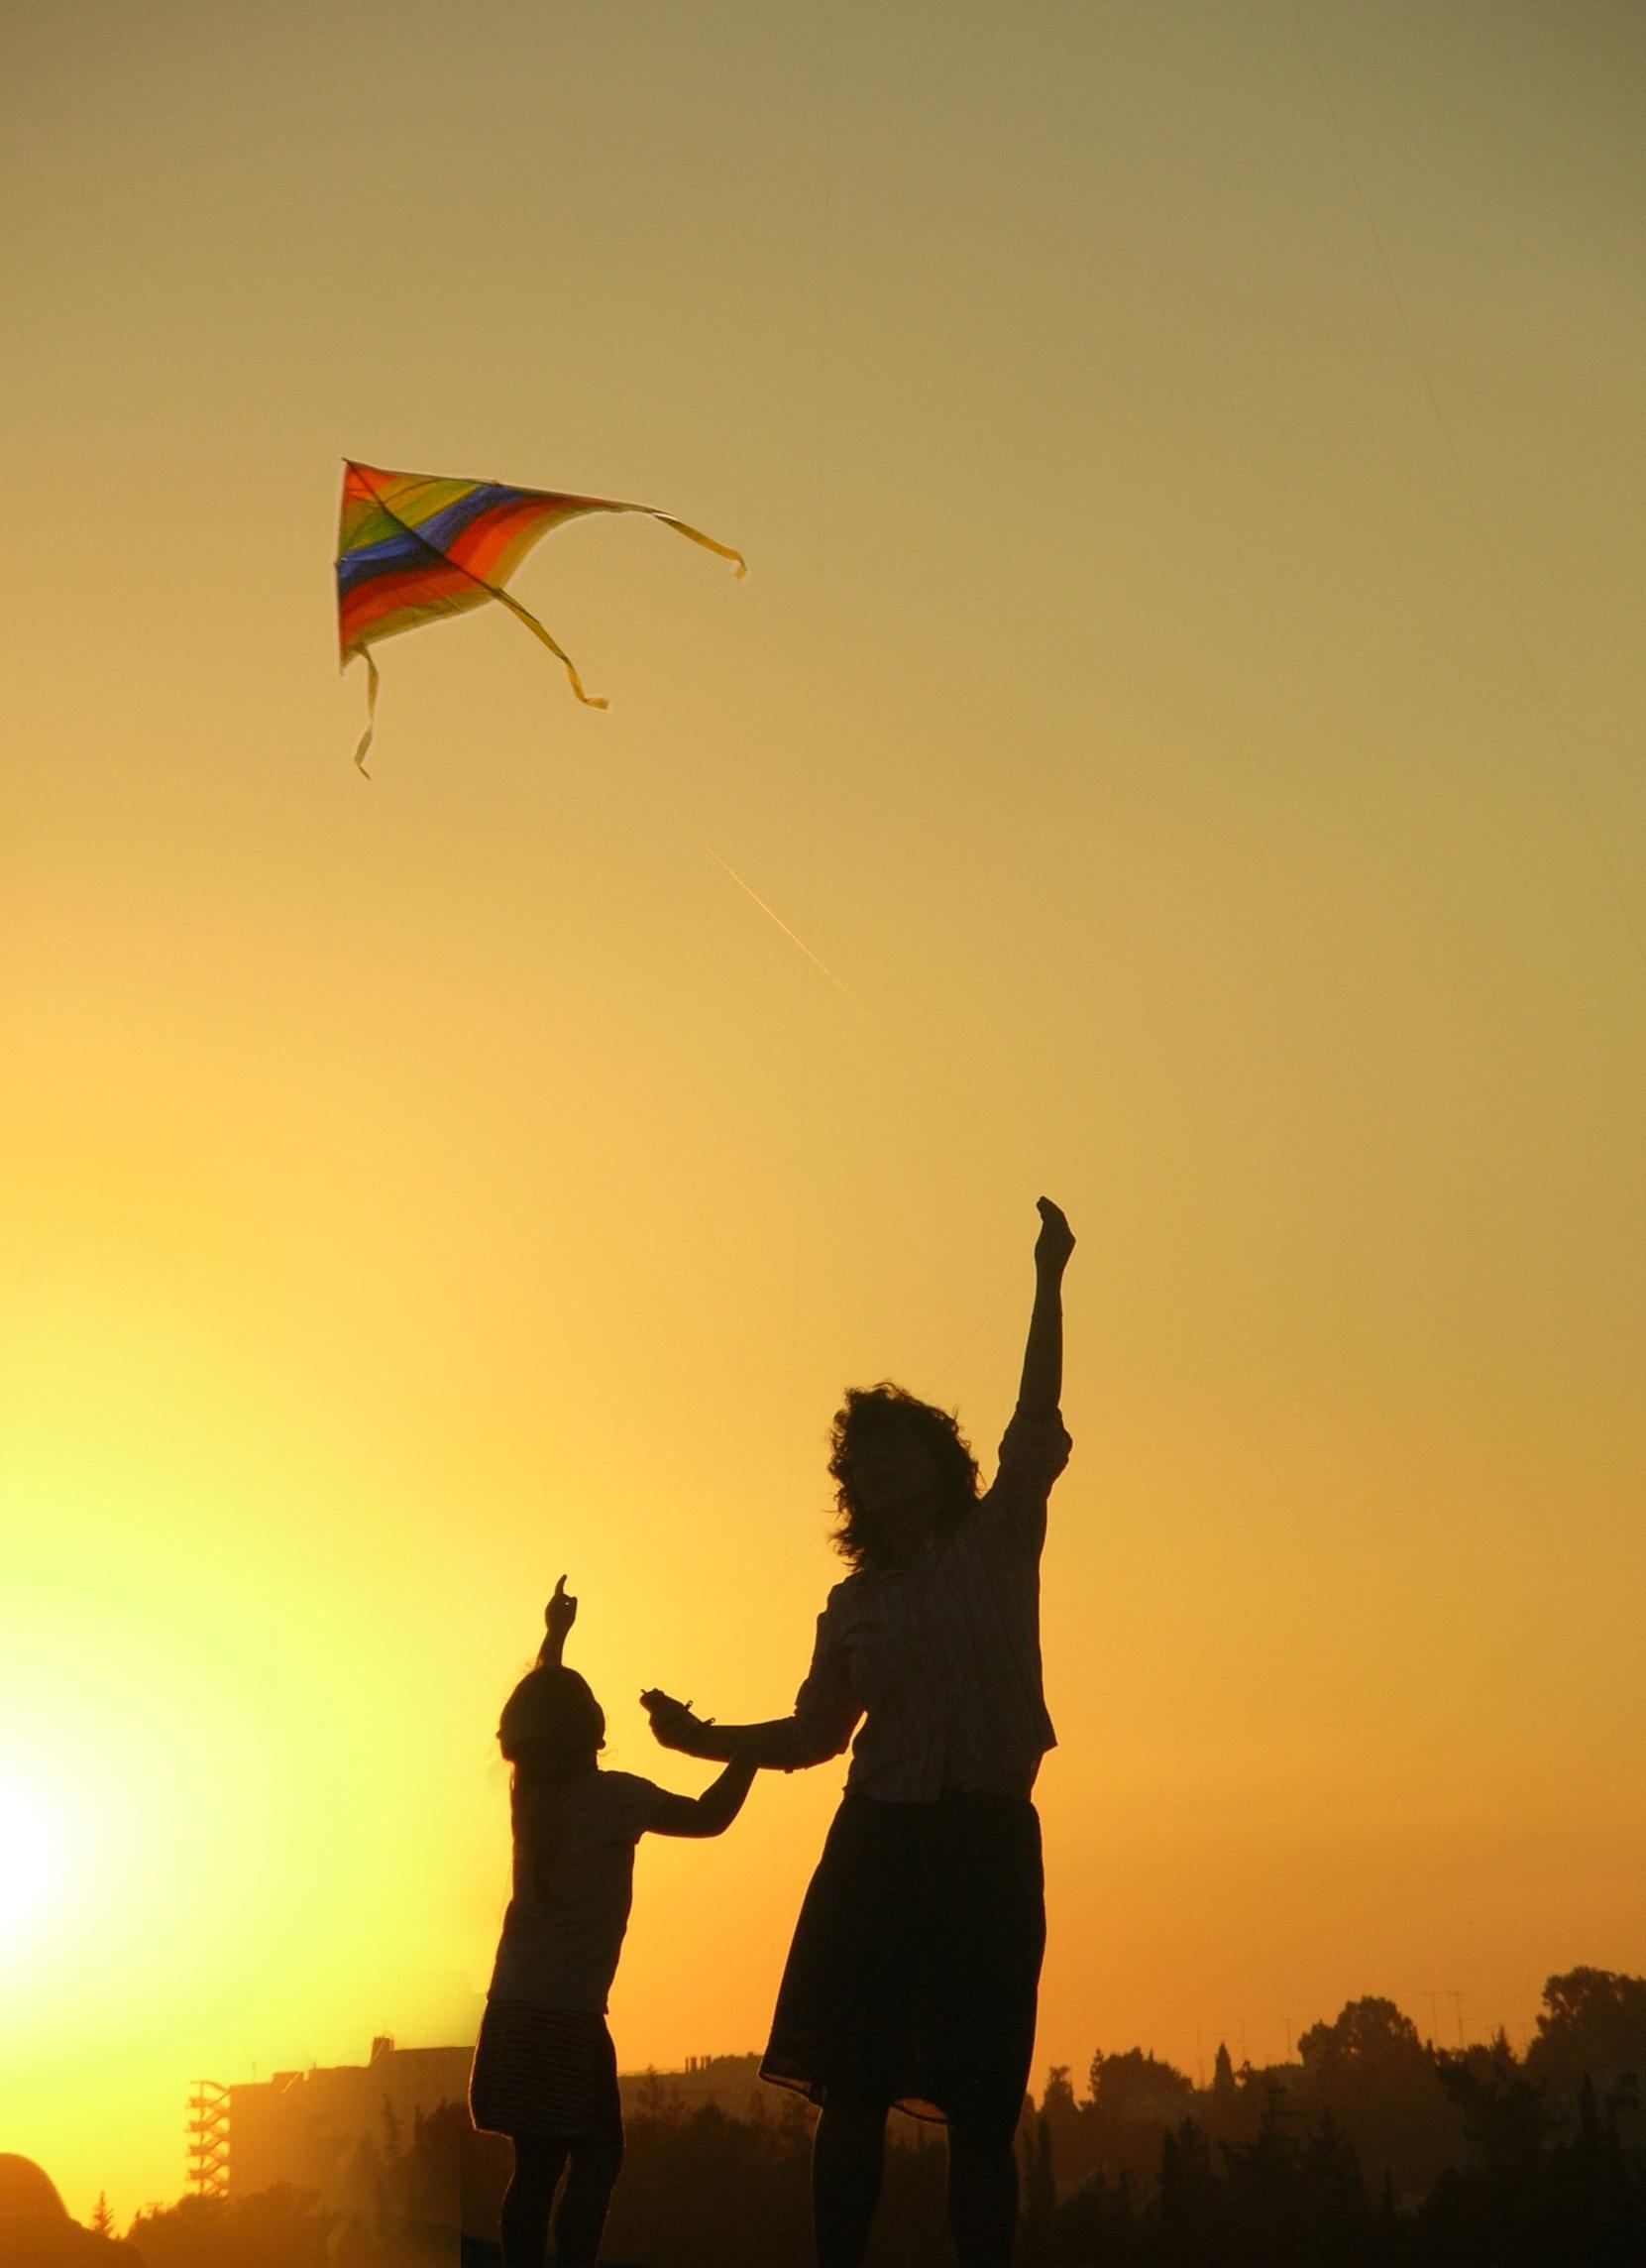 kite-1666816